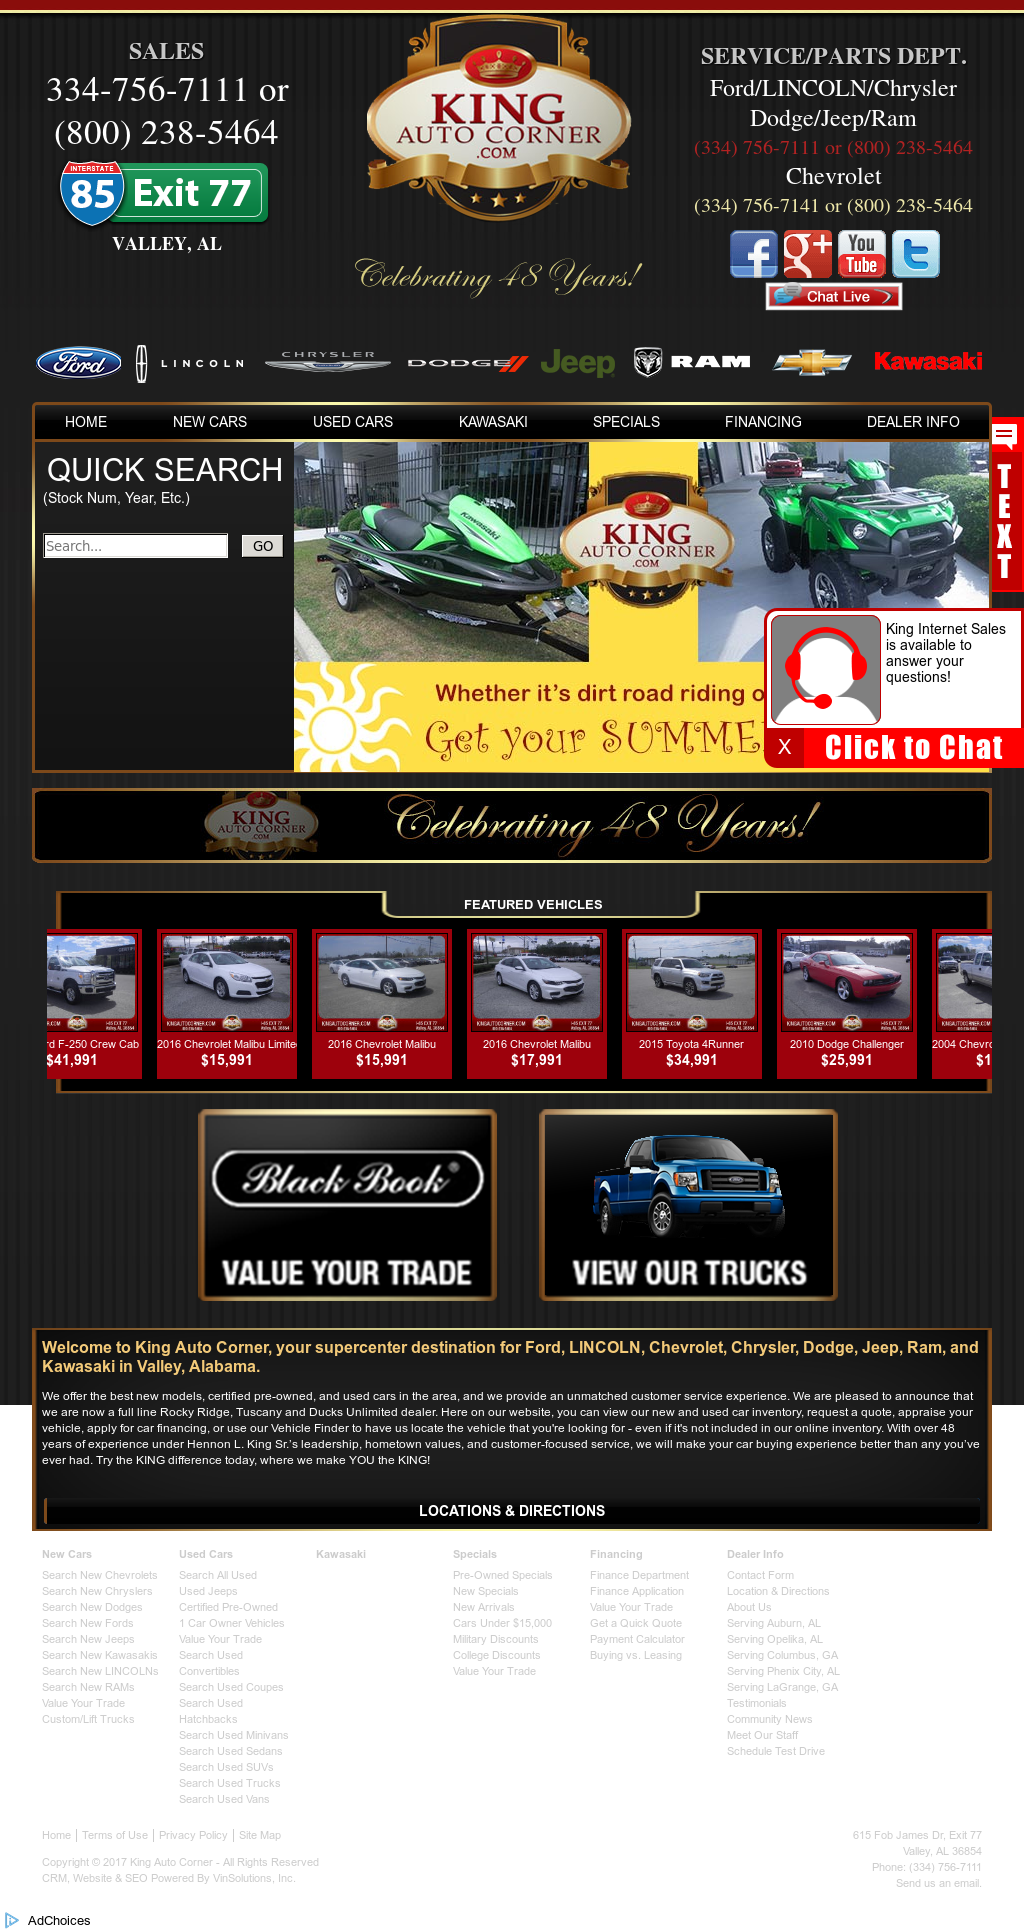 King Auto Corner Valley,Al Website History